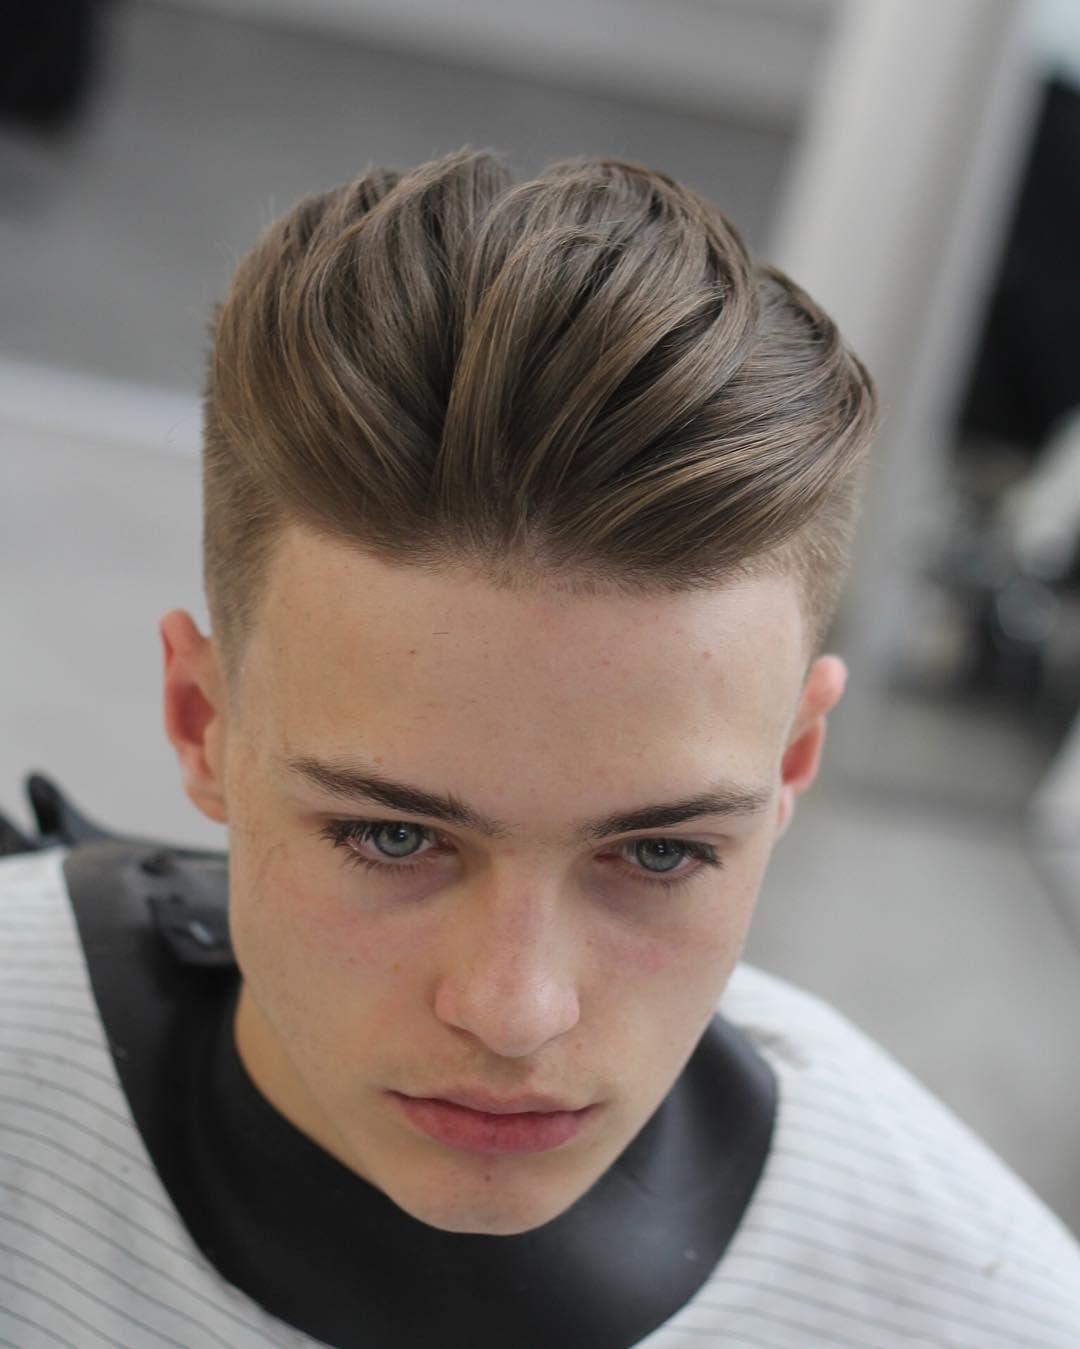 100 New Men S Hairstyles Top Picks New Men Hairstyles Mens Hairstyles Boy Hairstyles